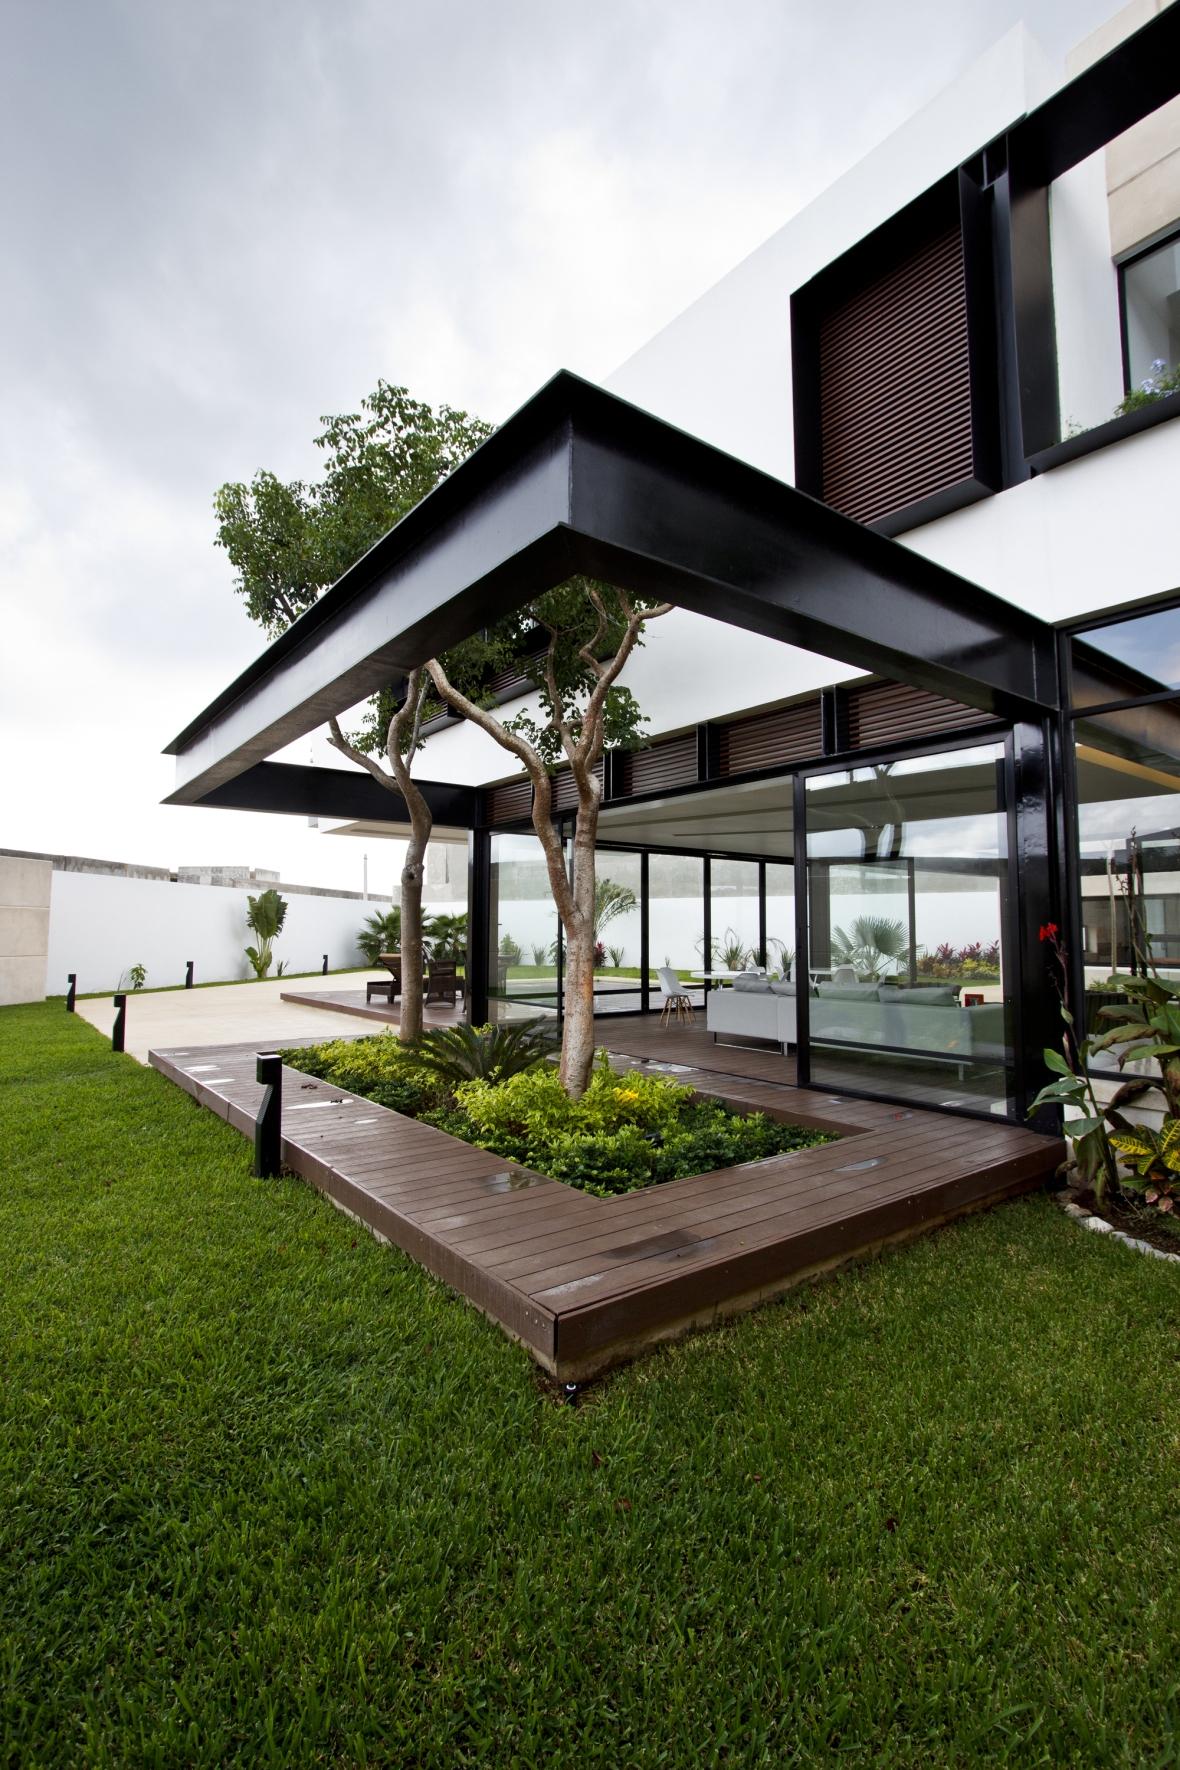 arhitect timisoara, proiecte case moderne,proiecte case moderne, casa moderna 2013, proiecte case ieftine, case mici, proiecte case mici, case moderne, proiect de casa, case timisoara, proiecte case timisoara, case arhipura, arhipura, terasa exterioara metalica